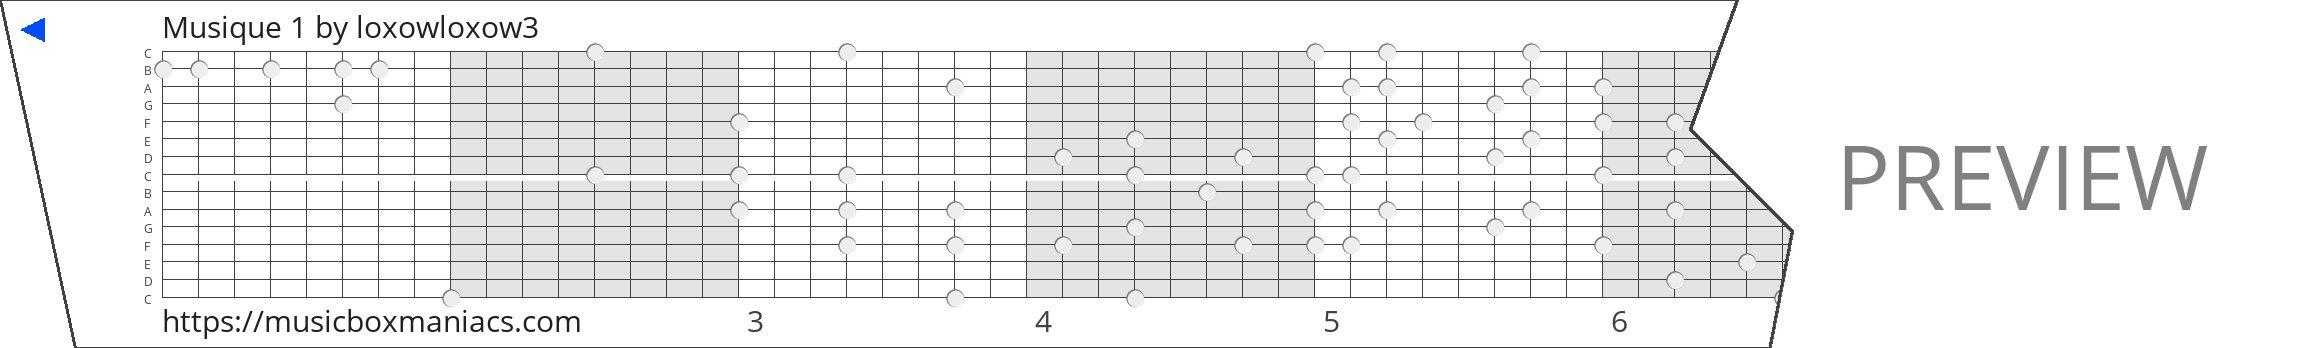 Musique 1 15 note music box paper strip